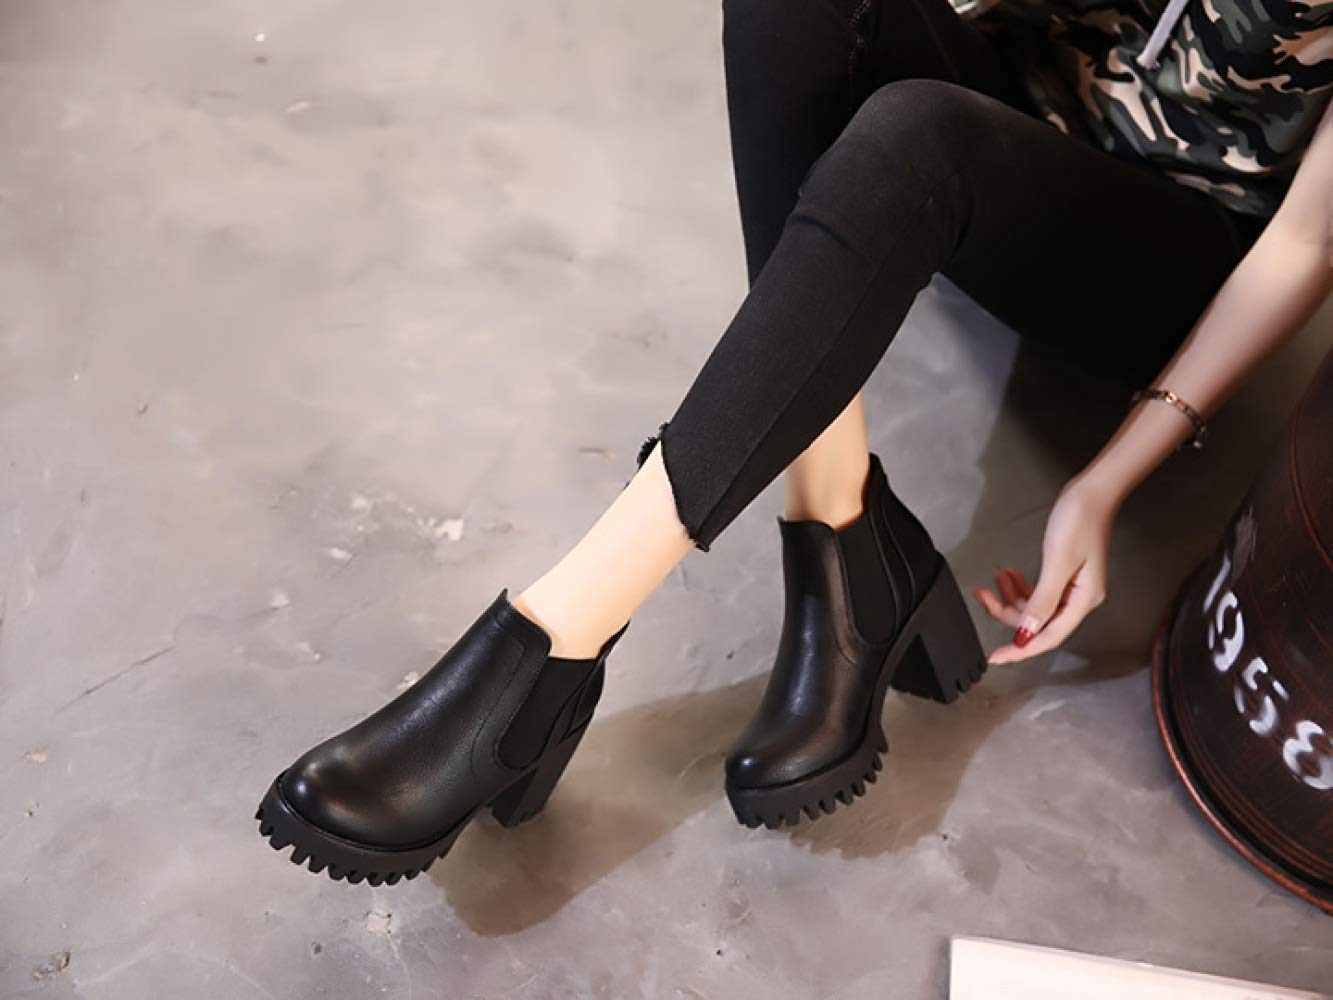 Oudan Oudan Oudan Weibliche Herbst Und Winter Leder High Heels Stiefeletten Baumwolle Schuhe (Farbe   1 Größe   34EU) 736b6f